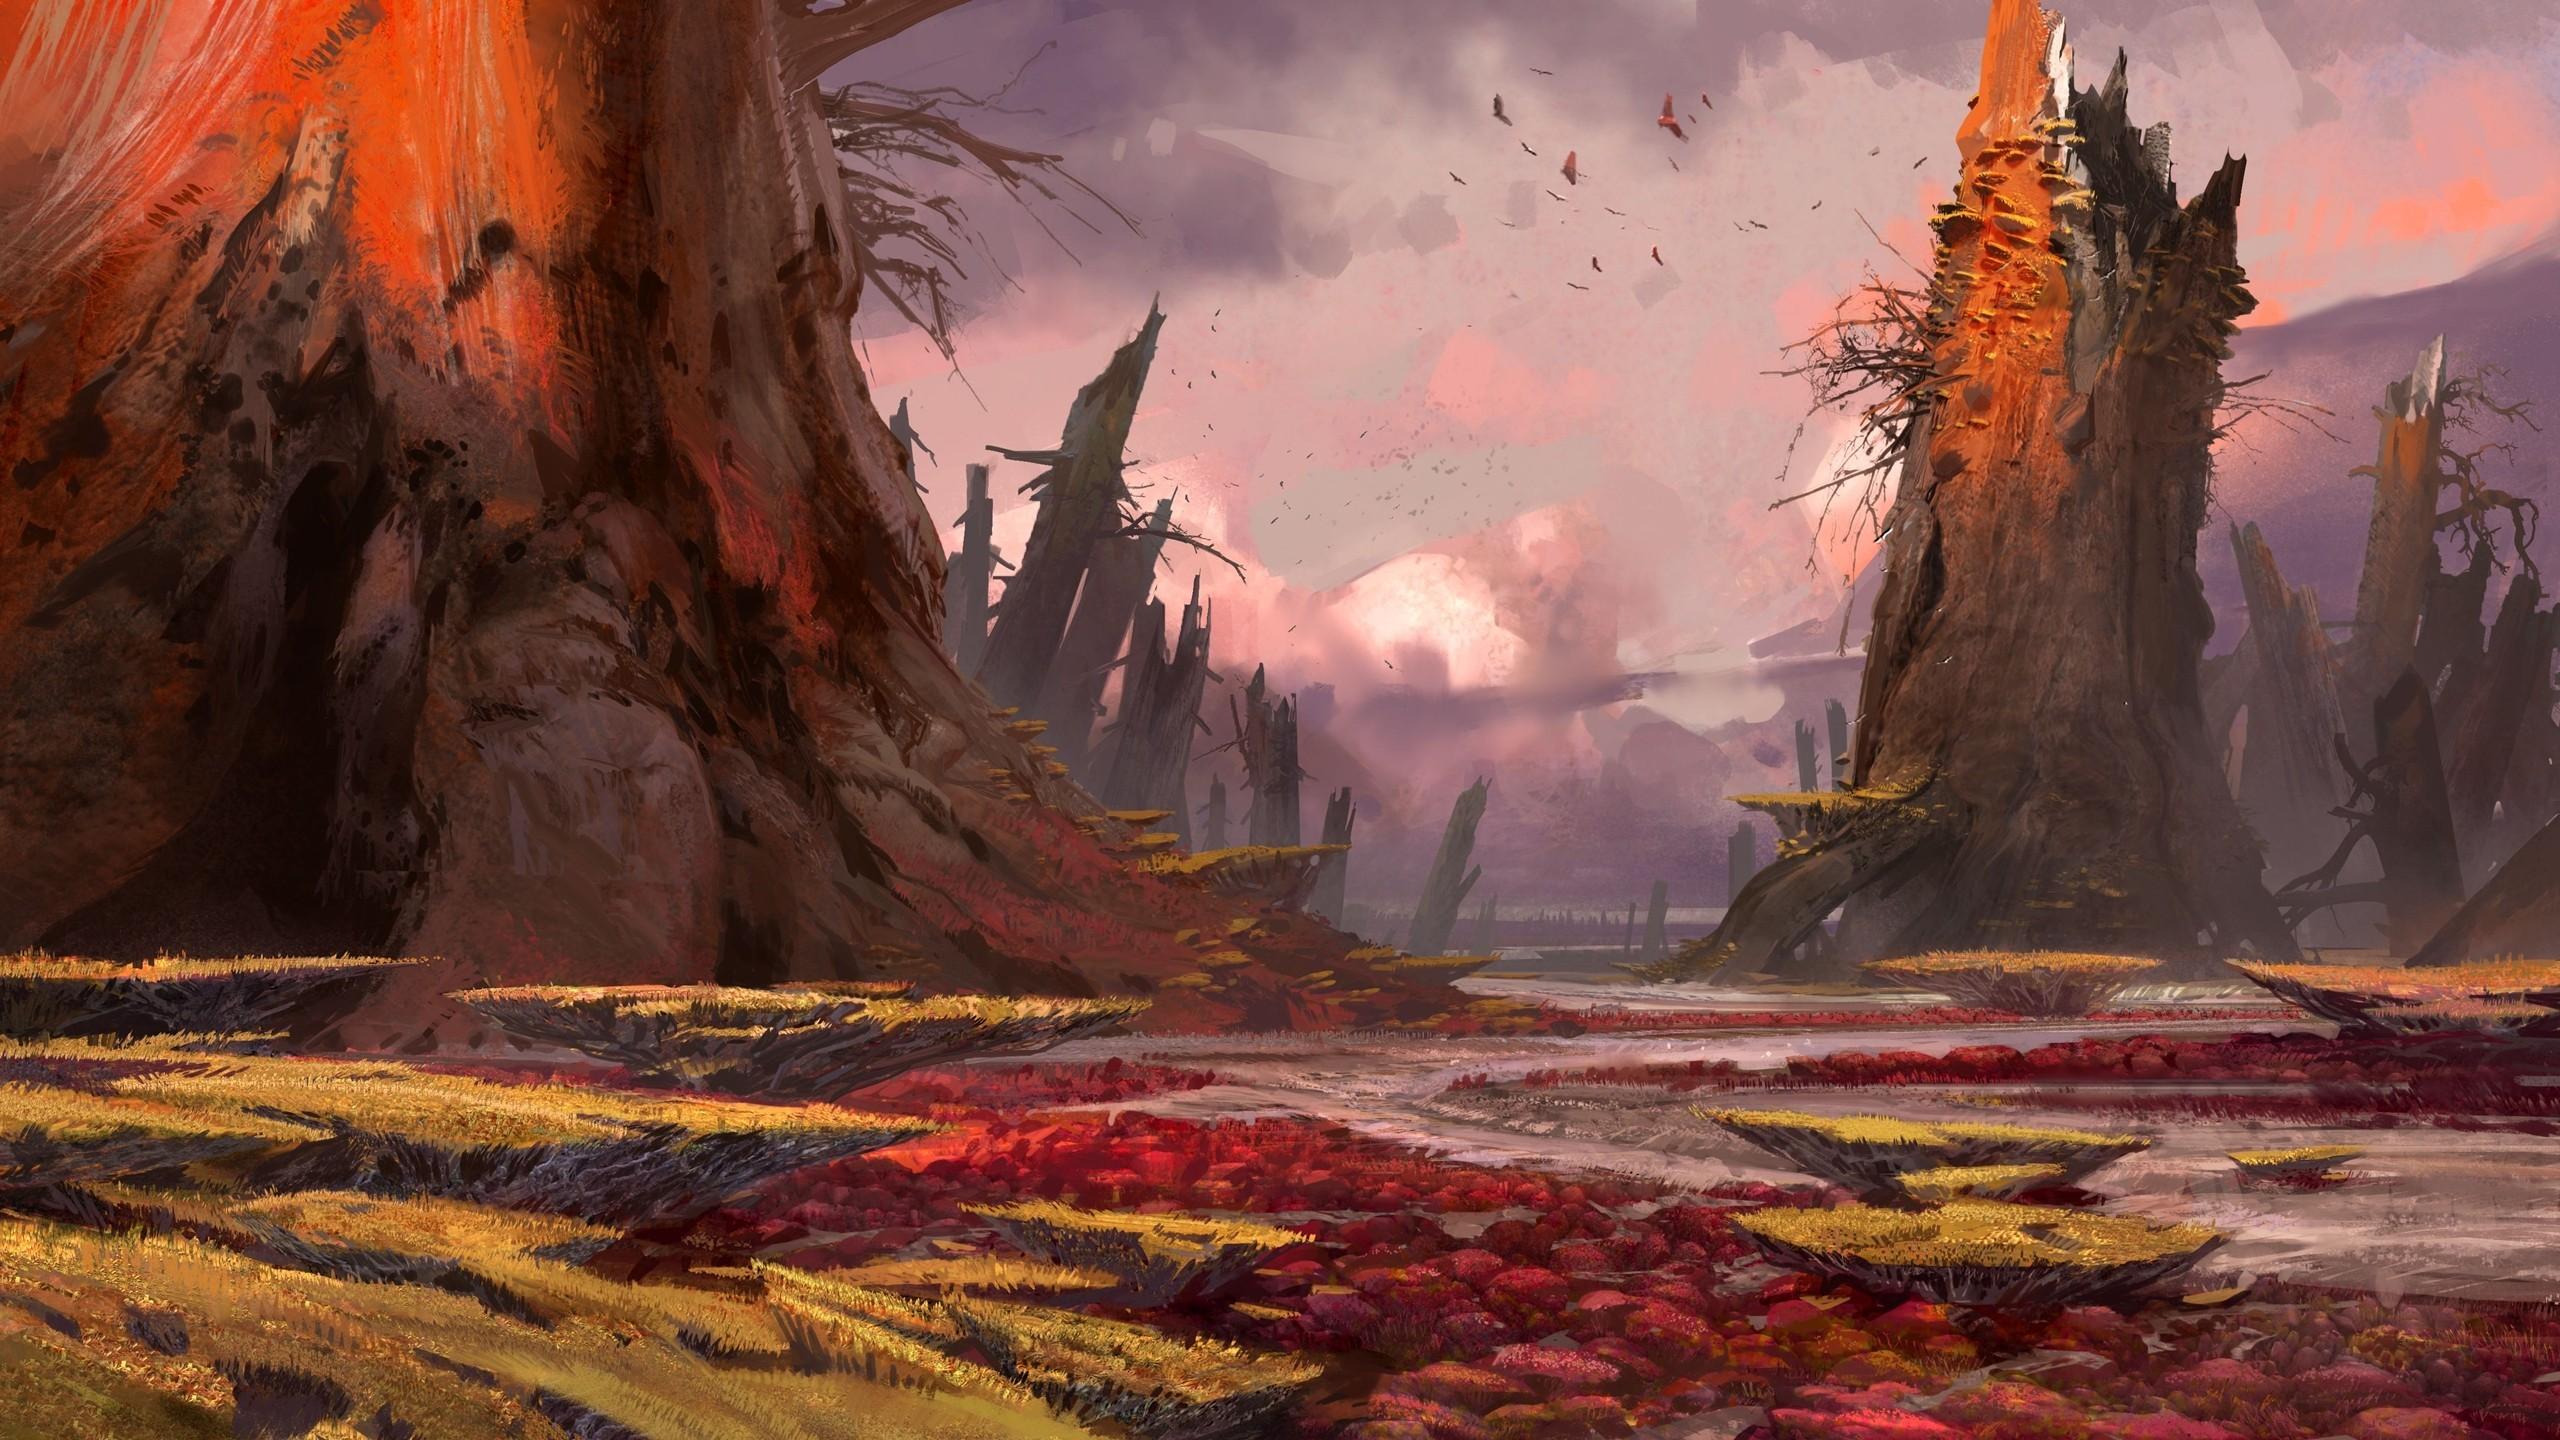 Landscapes birds concept art artwork Bungie Destiny (video game) wallpaper  | | 214227 | WallpaperUP